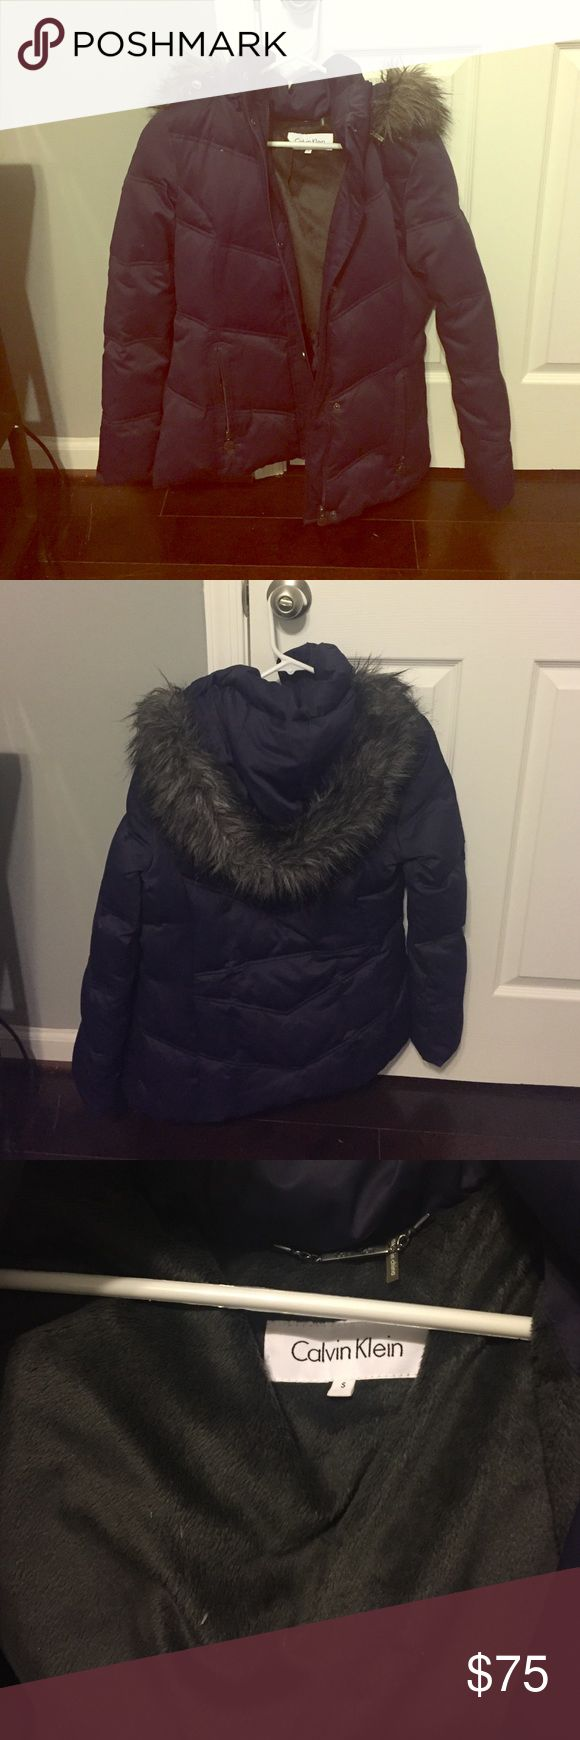 Calvin Klein winter puffer jacket w faux fur hood Purple winter jacket by Calvin Klein. Detachable faux fur hood. Excellent condition and super warm! Great jacket Calvin Klein Jackets & Coats Puffers